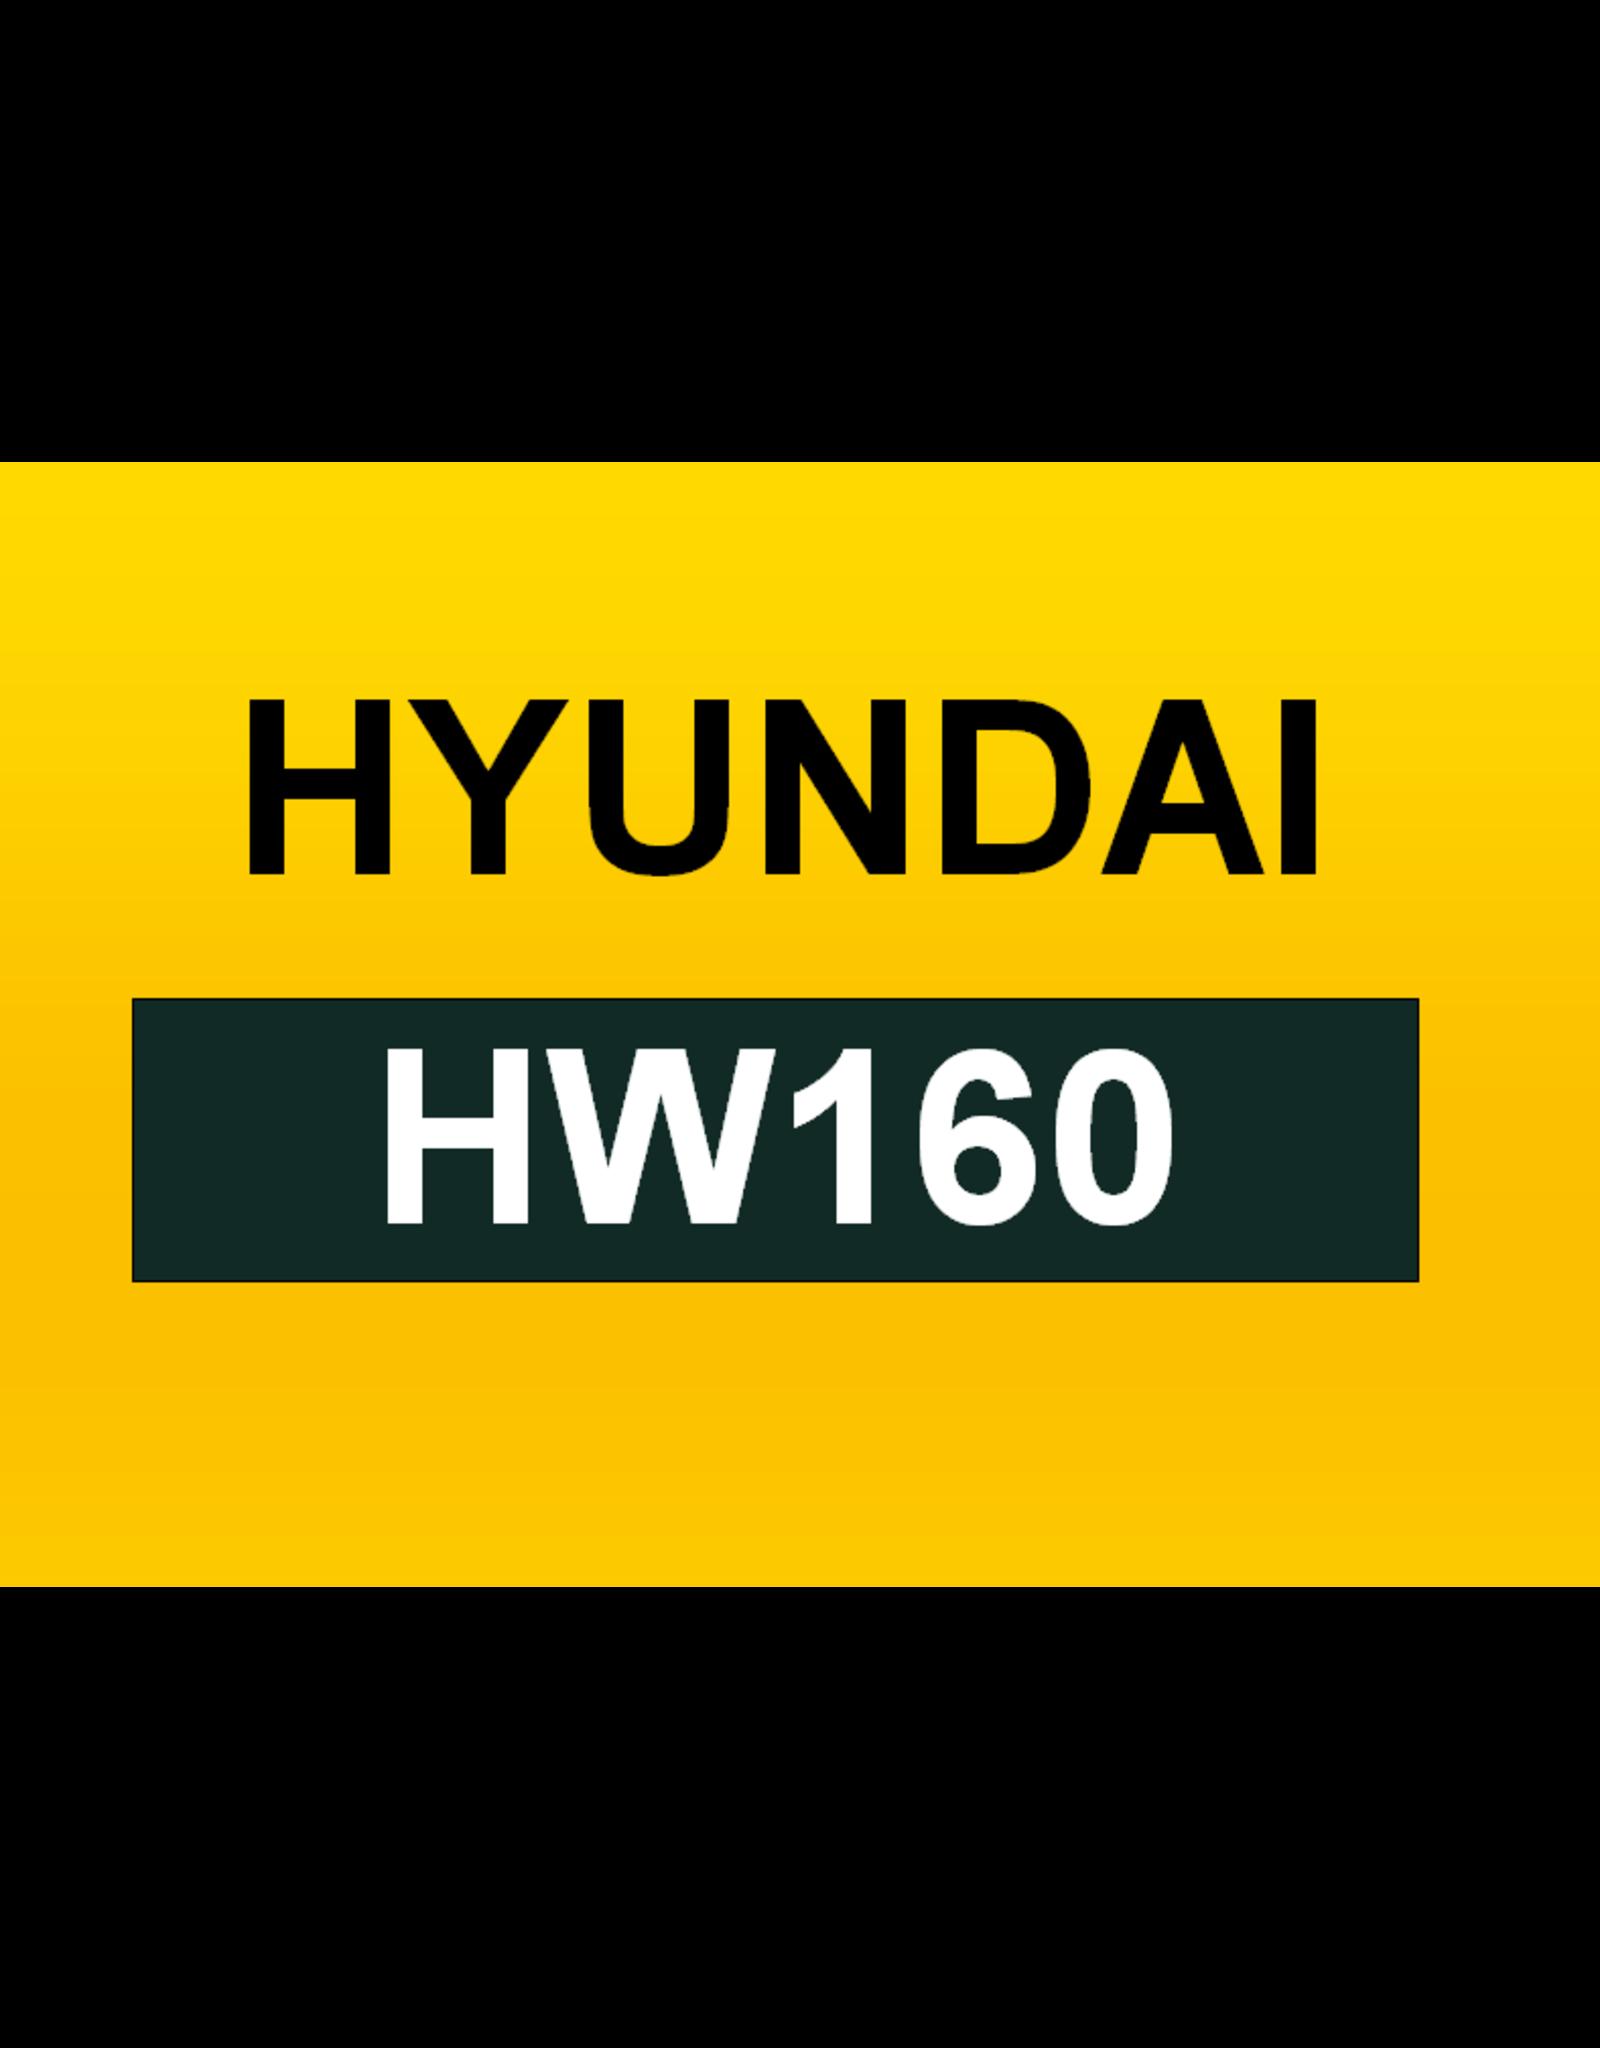 Echle Hartstahl GmbH FOPS for Hyundai HW160